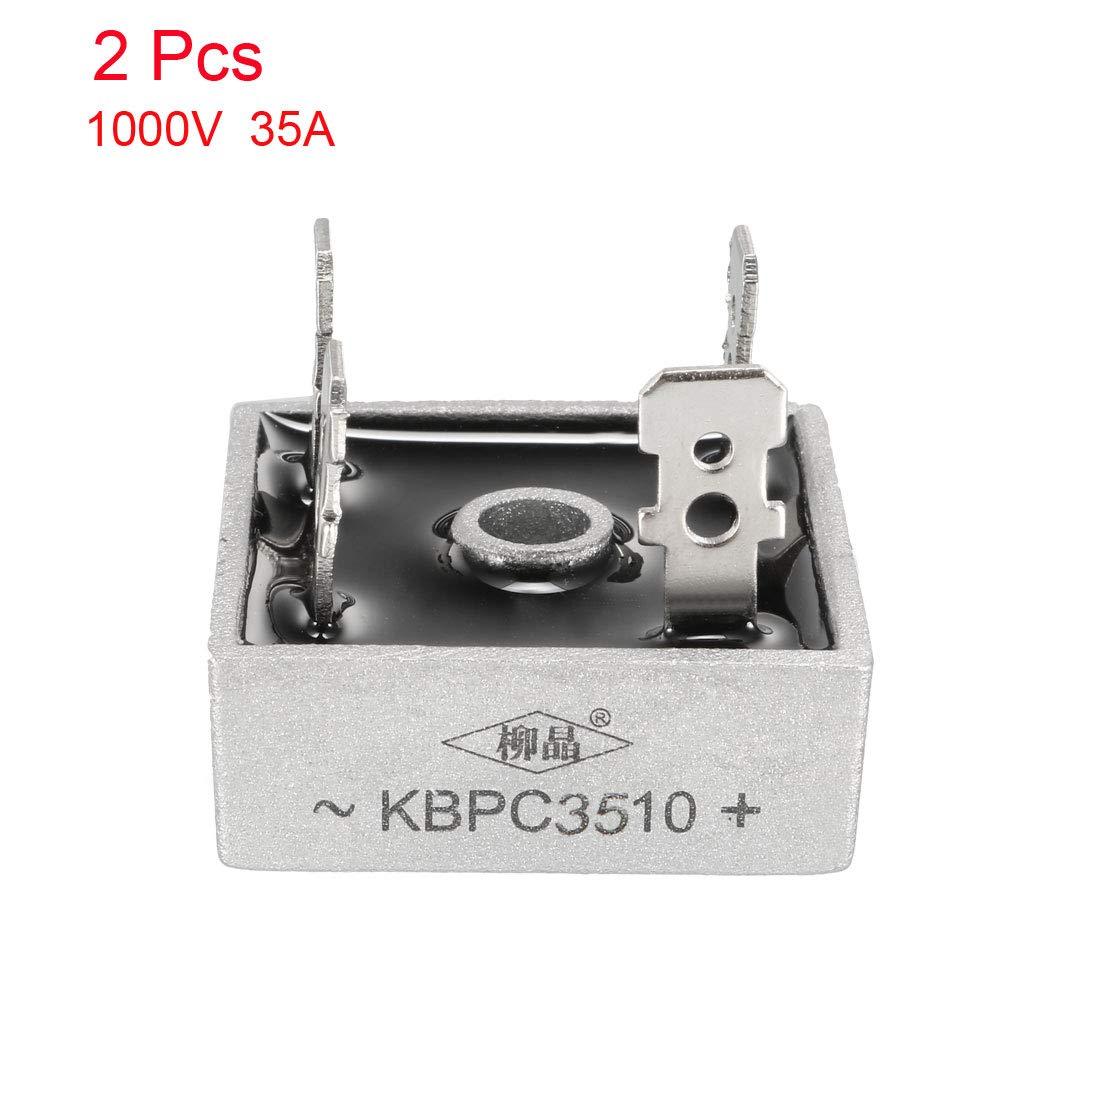 sourcing map Kbpc3510 1000V 35A Puente Rectificador Monof/ásico De Media Onda Gris 2Pcs